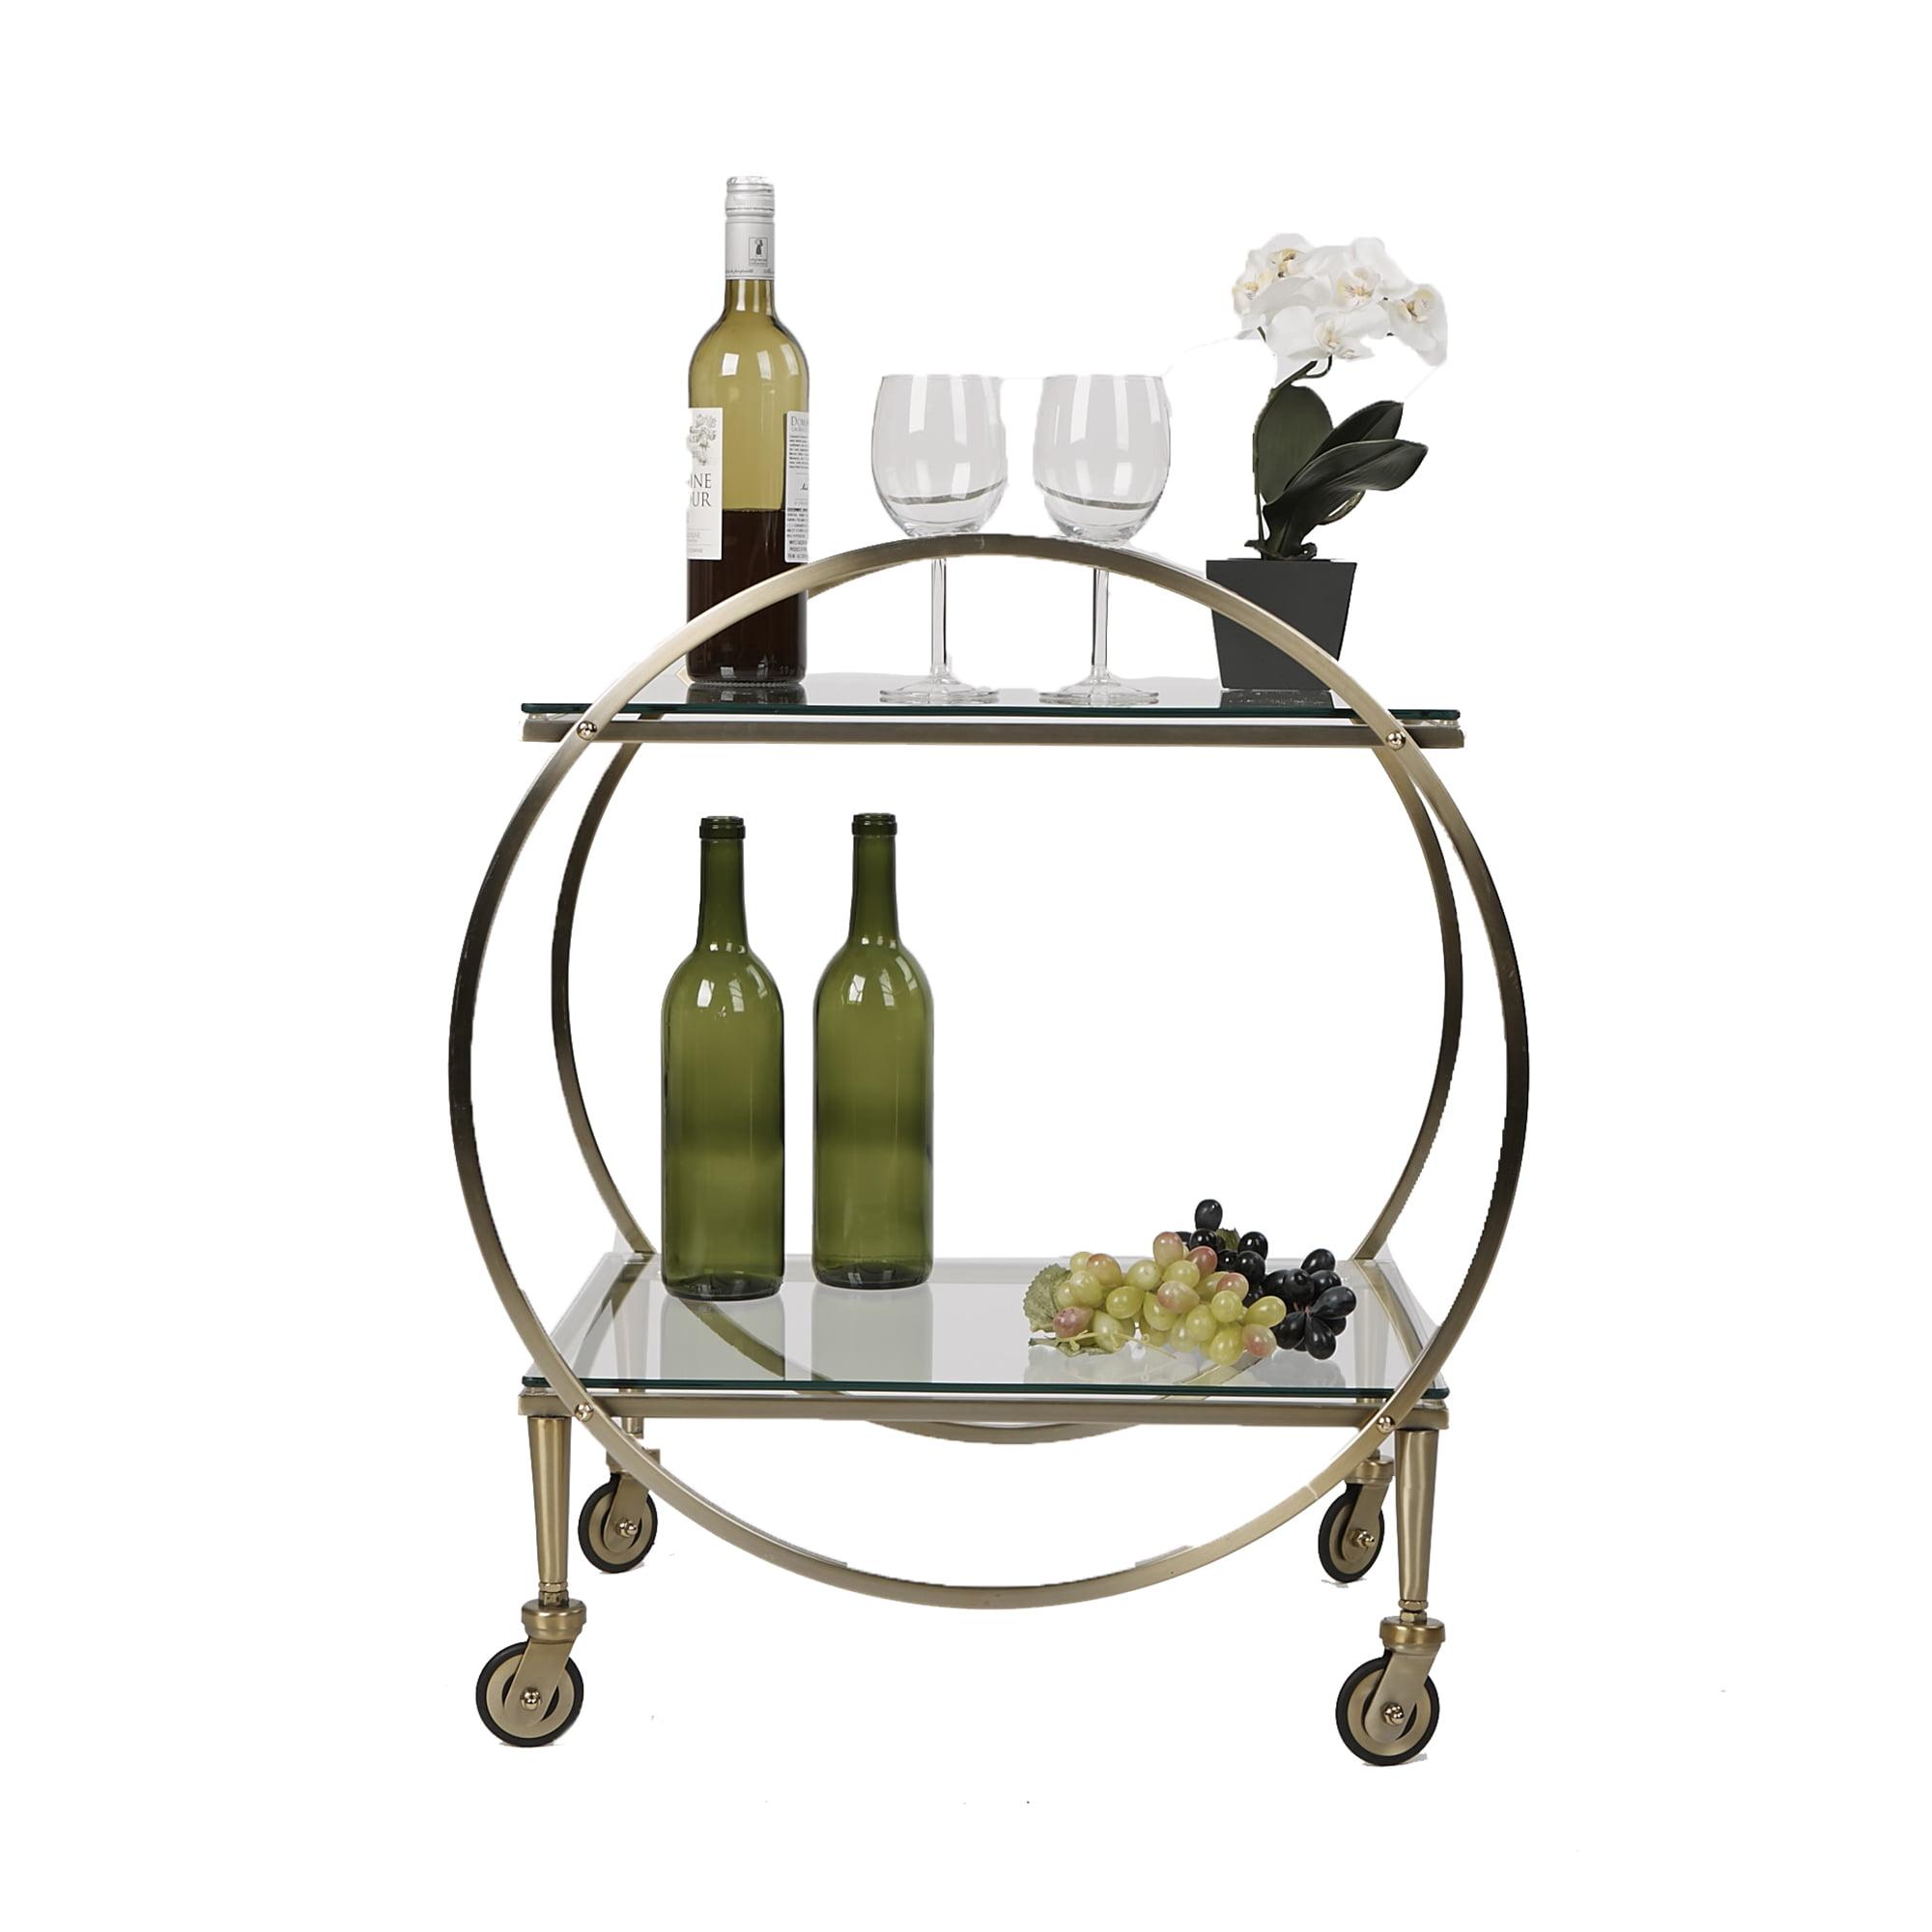 Mind Reader 2 Tier Bar Cart, Metal Bar Cart with Glass Top, Portable Bar Cart, Mobile Glass Pushing Cart, Glass Top Gold Finish, Clear